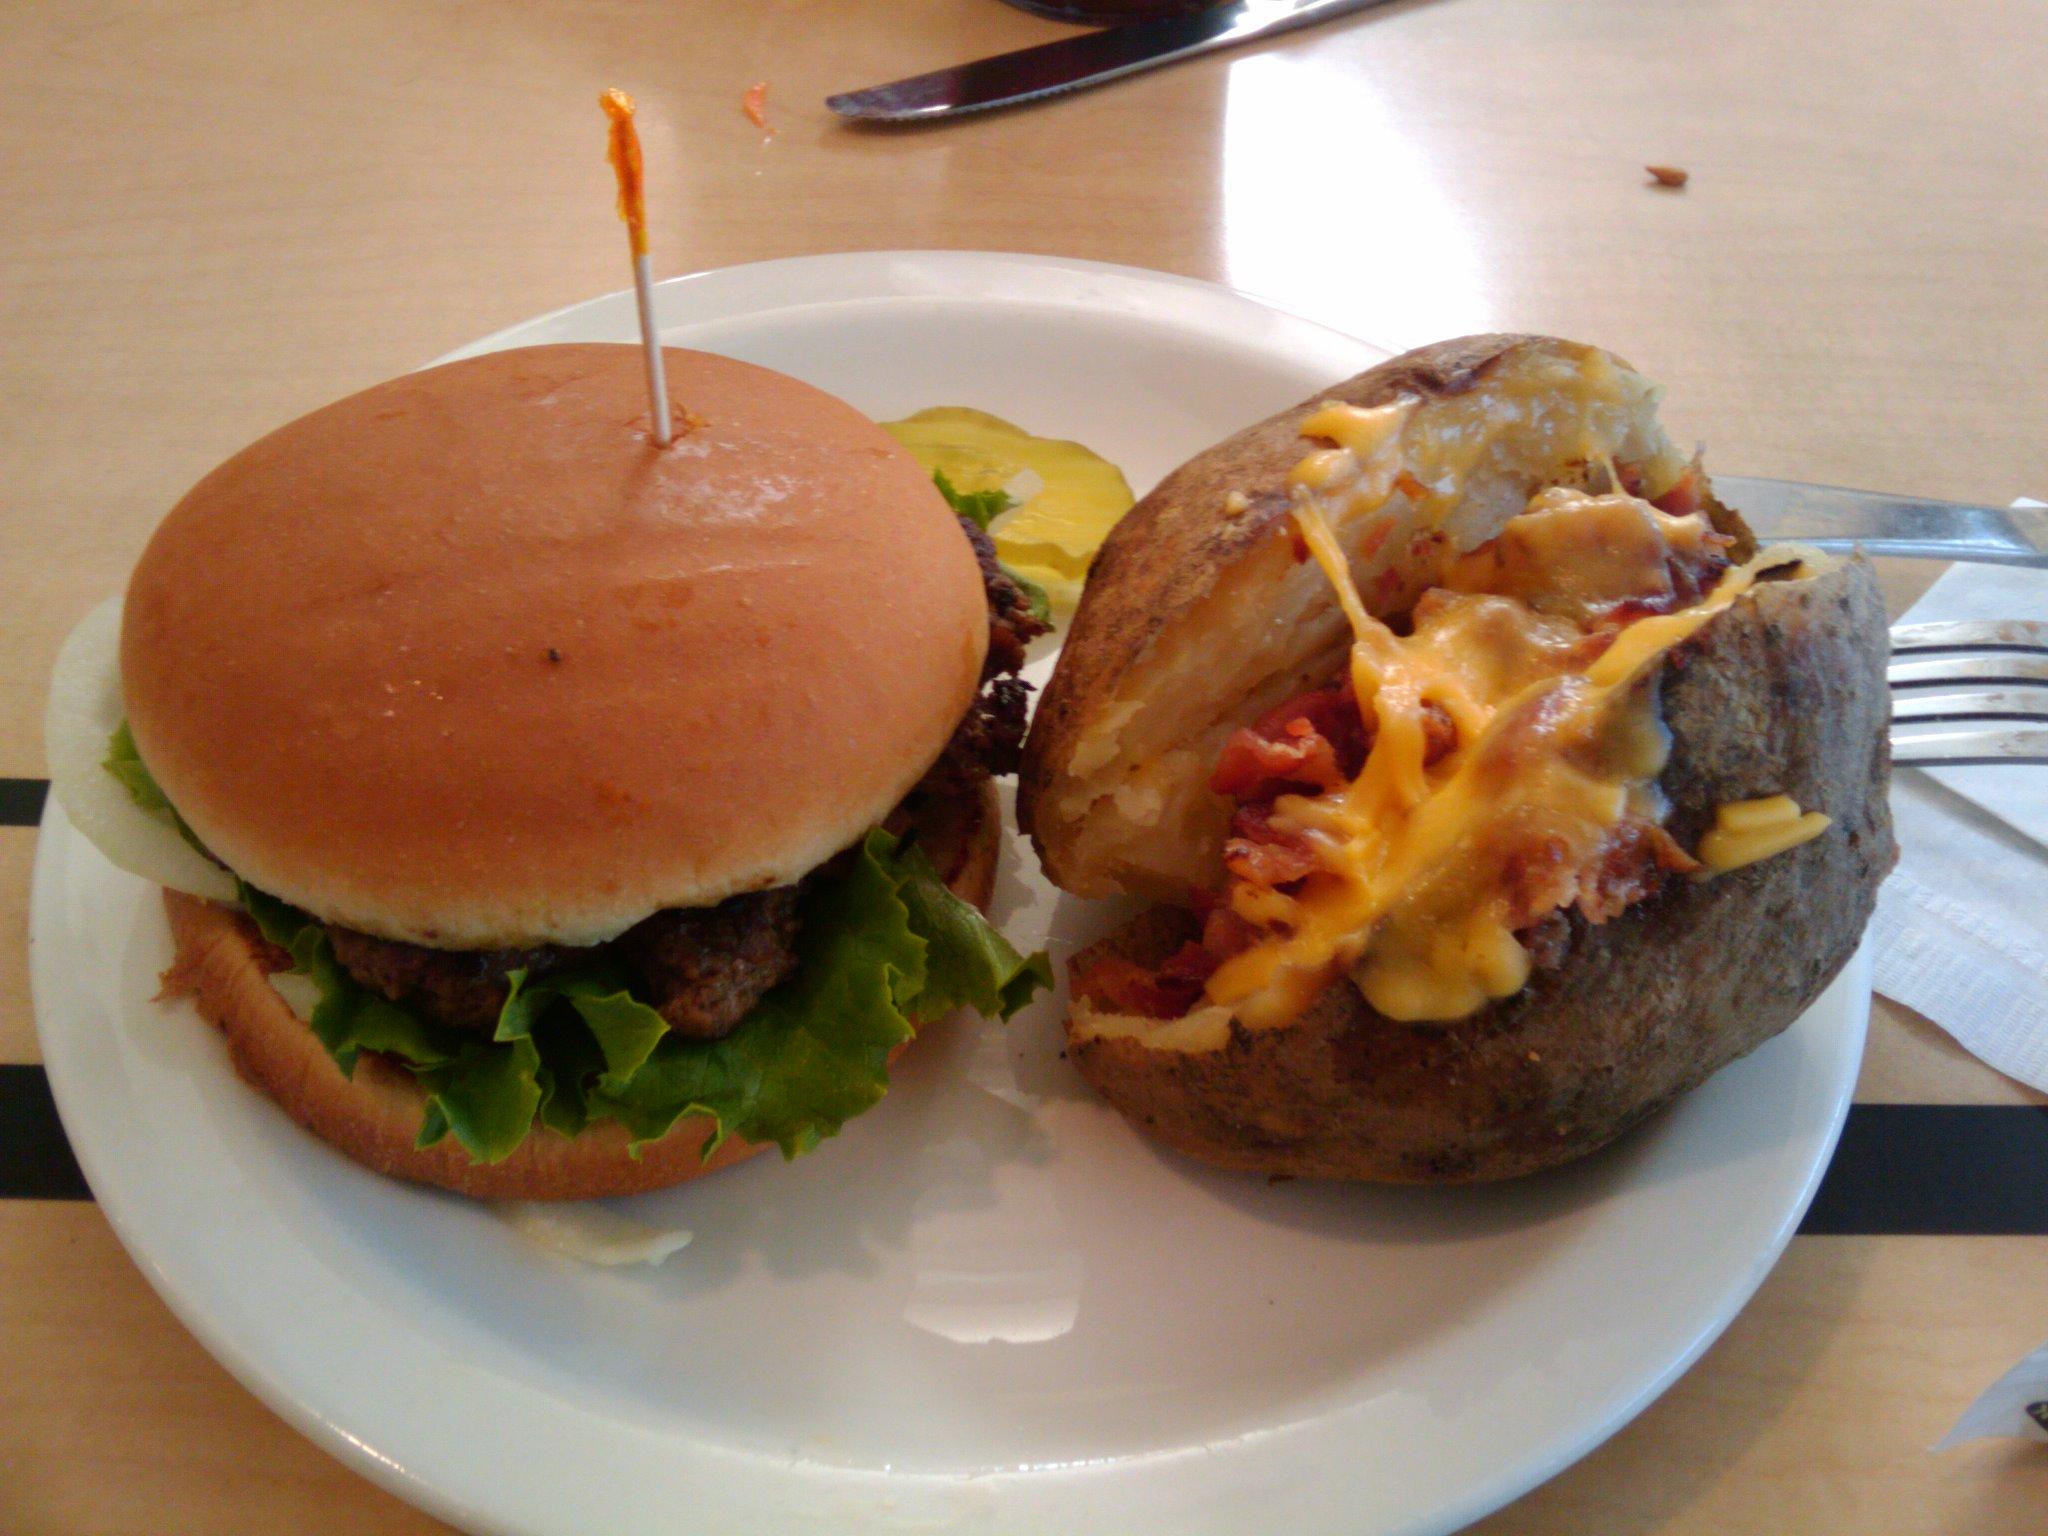 Atlanta, ga :: Burger and a loaded baked potato...from chick fill a